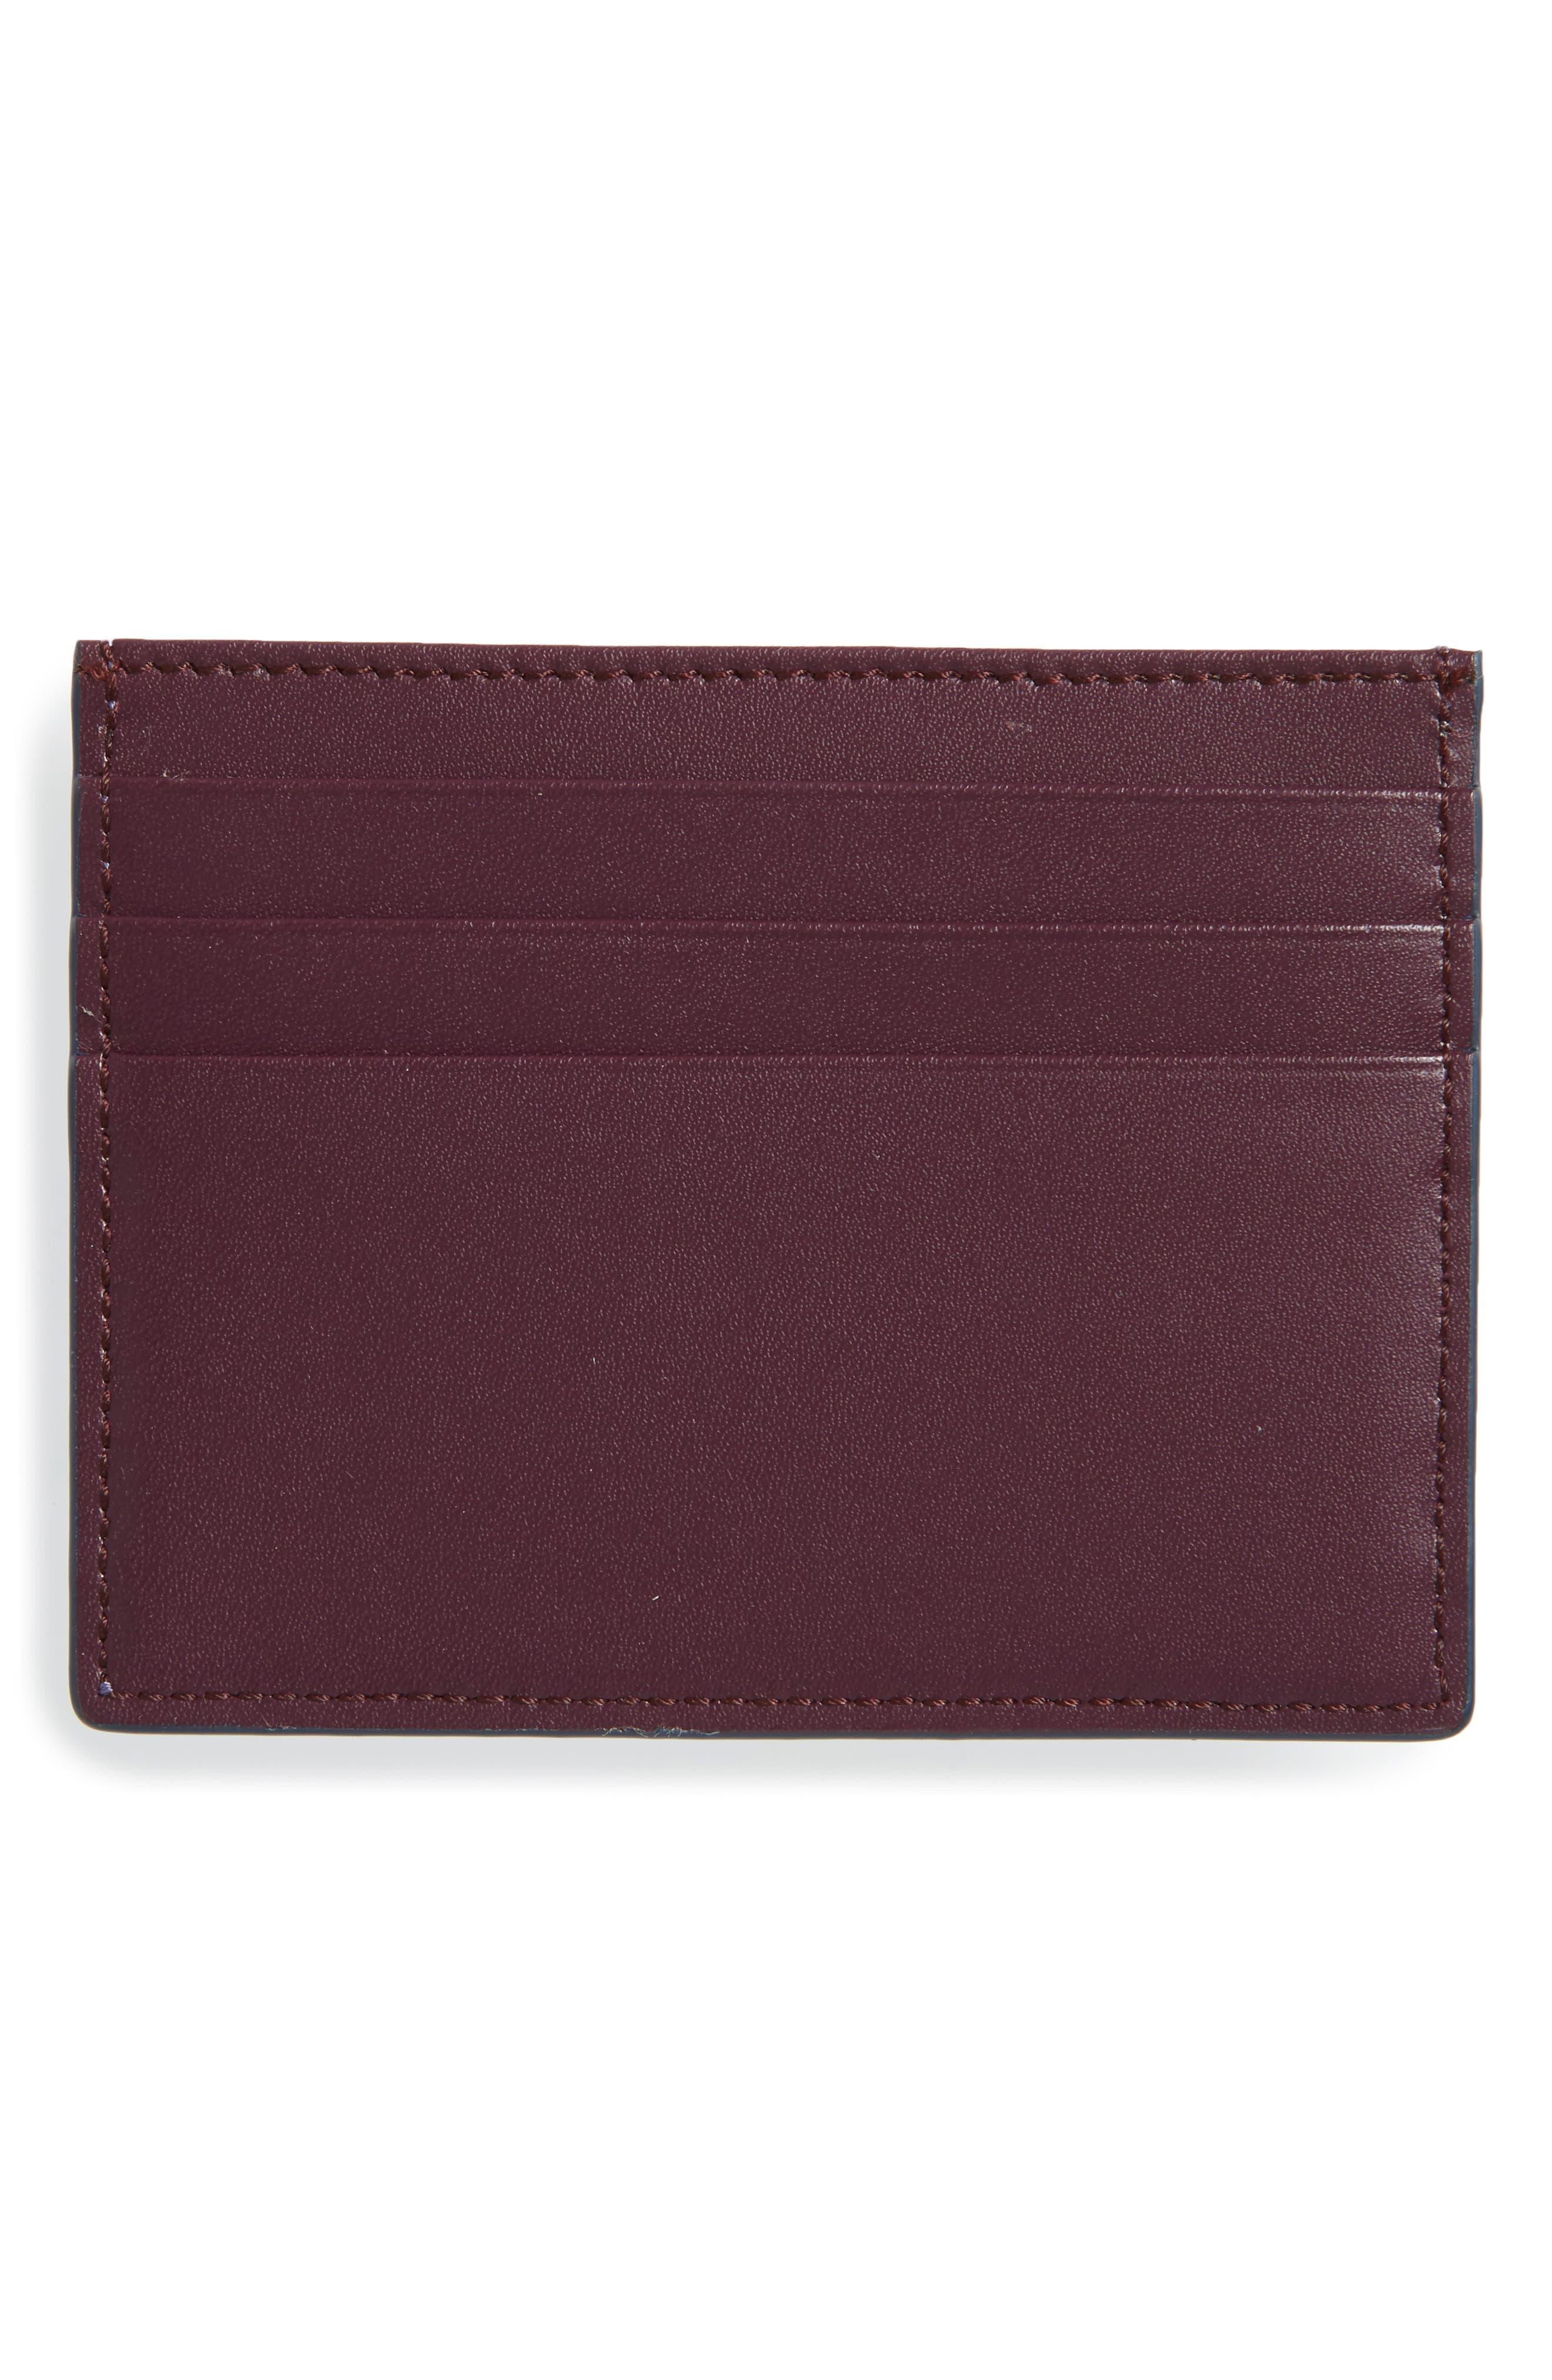 Rainbow Stud Leather Card Case,                             Alternate thumbnail 2, color,                             SKY/ MAROON